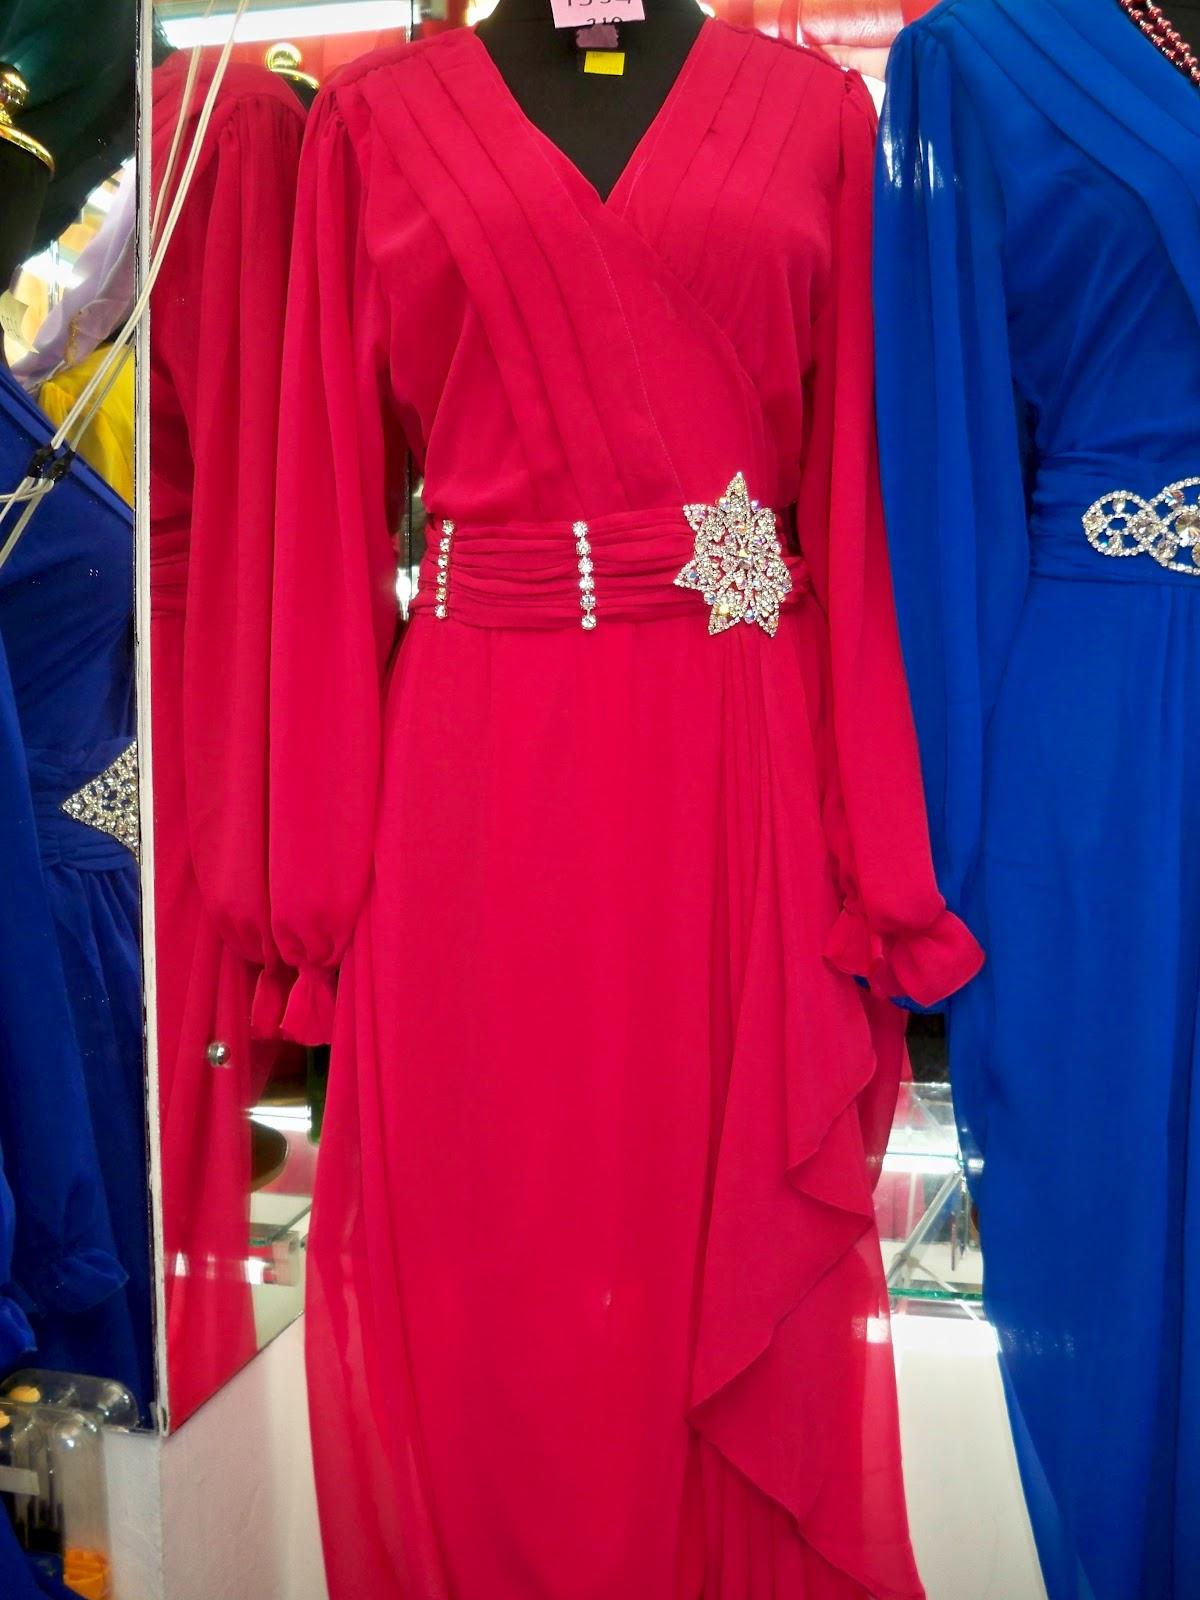 merk agustine jenis baju gaun gamis hiasan sworovski jenis bahan sifon